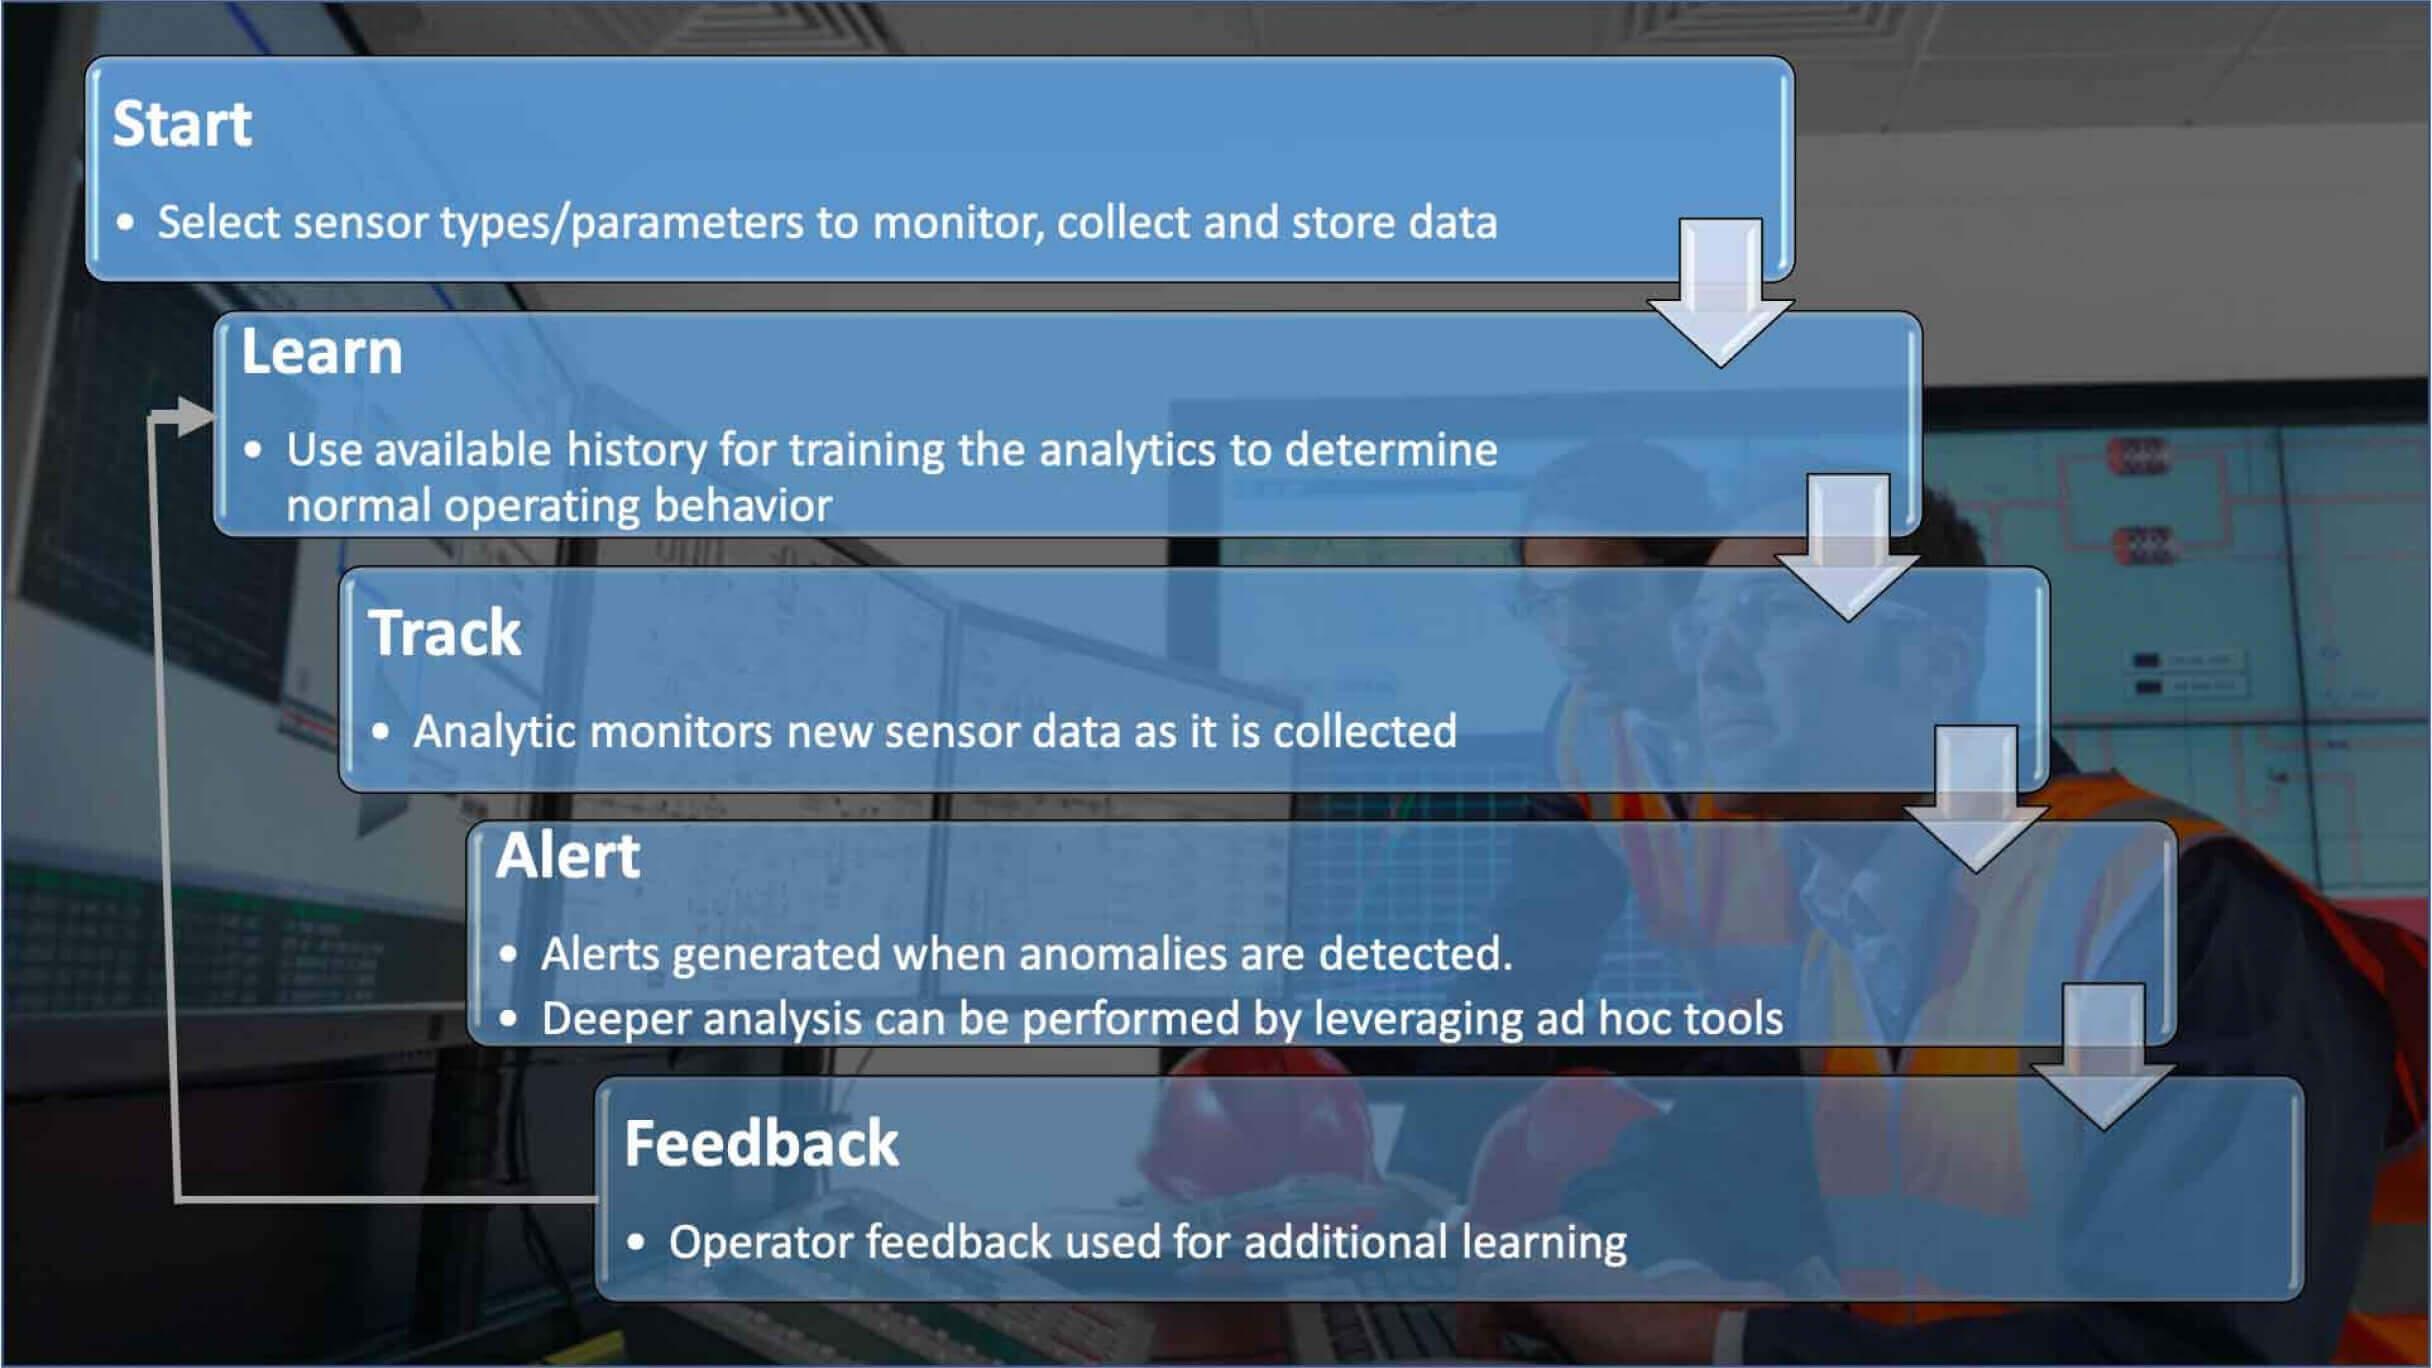 Steps to good sensor health strategy | GE Digital